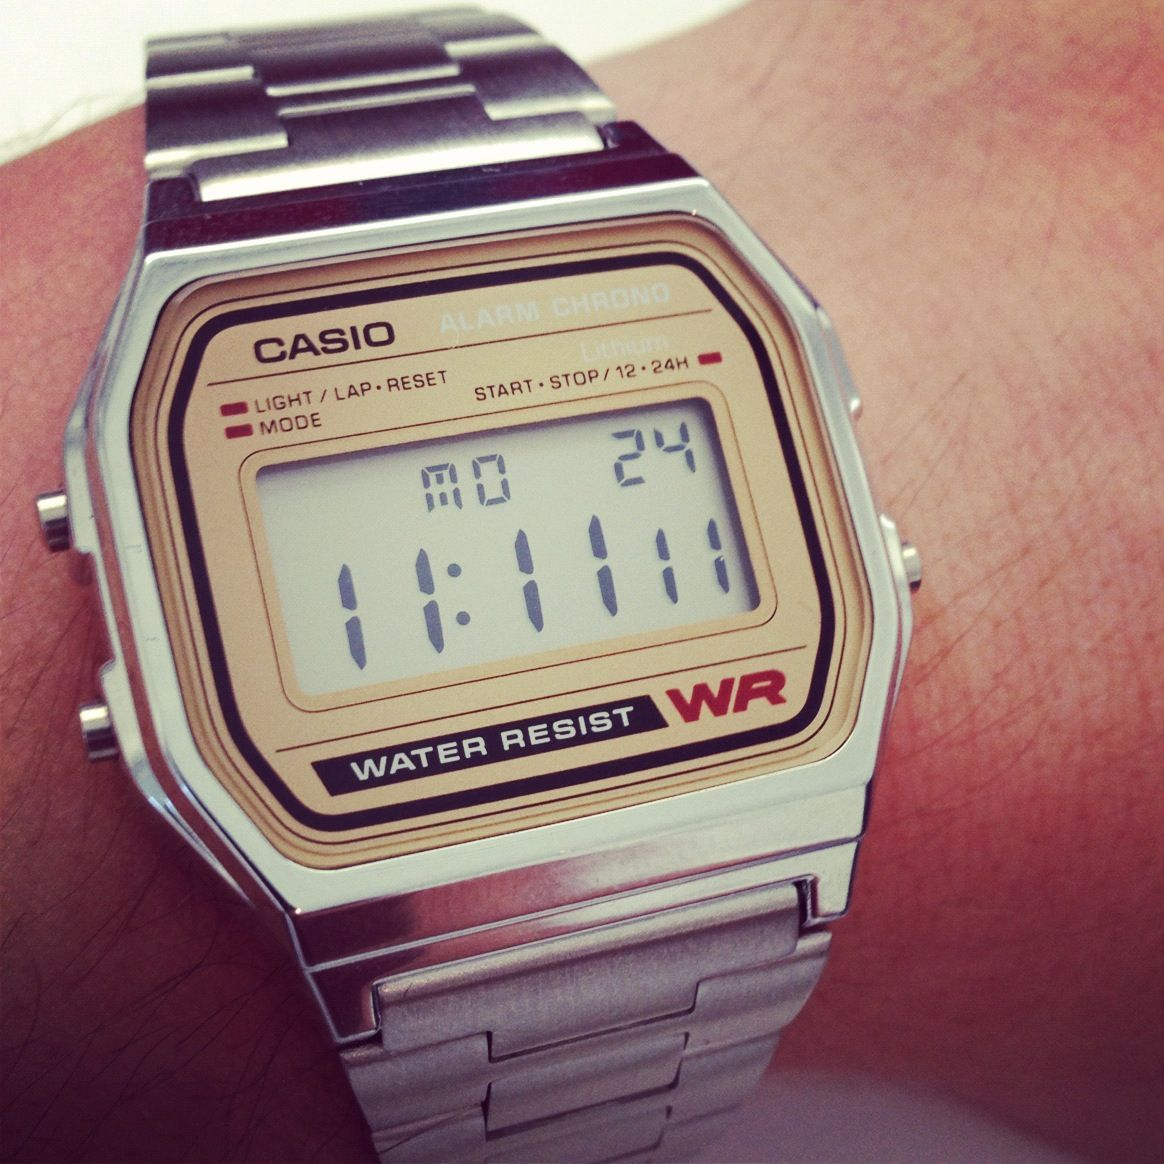 a1351bc08 Casio. | Accessories | Retro watches, Fashion, Casio digital